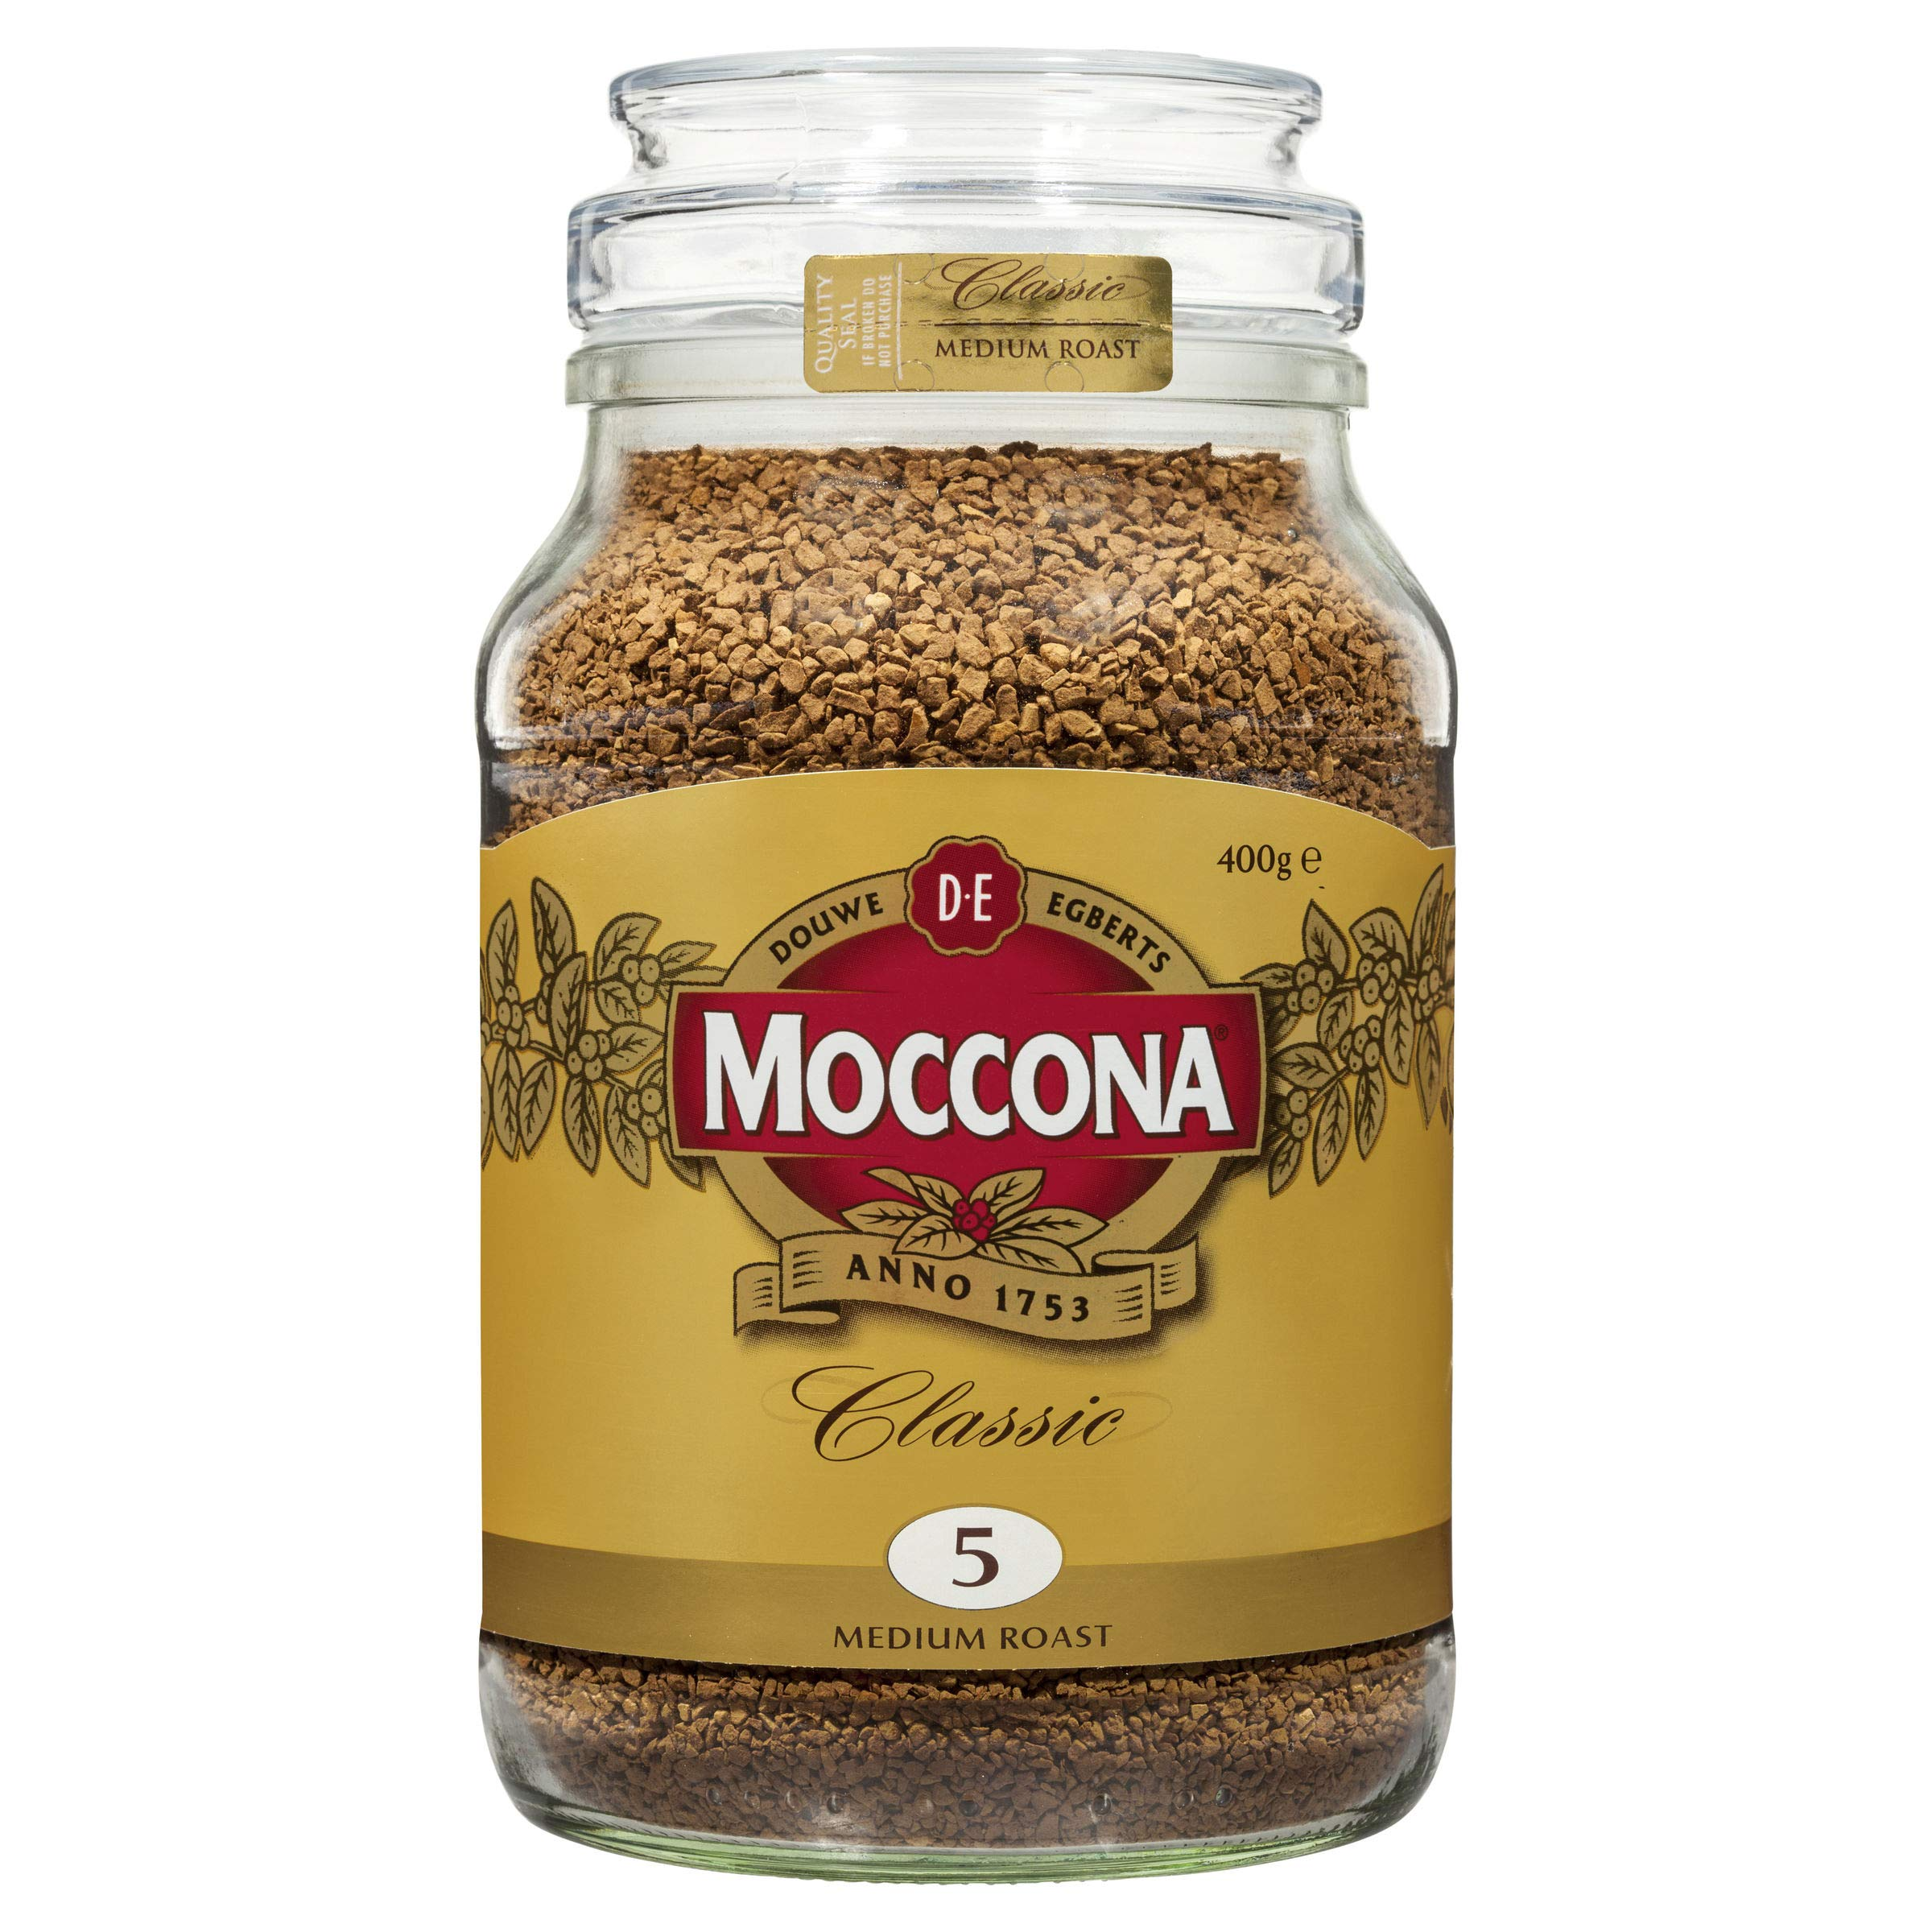 Moccona Freeze Dried Instance Coffee 400g (Medium Roasted)